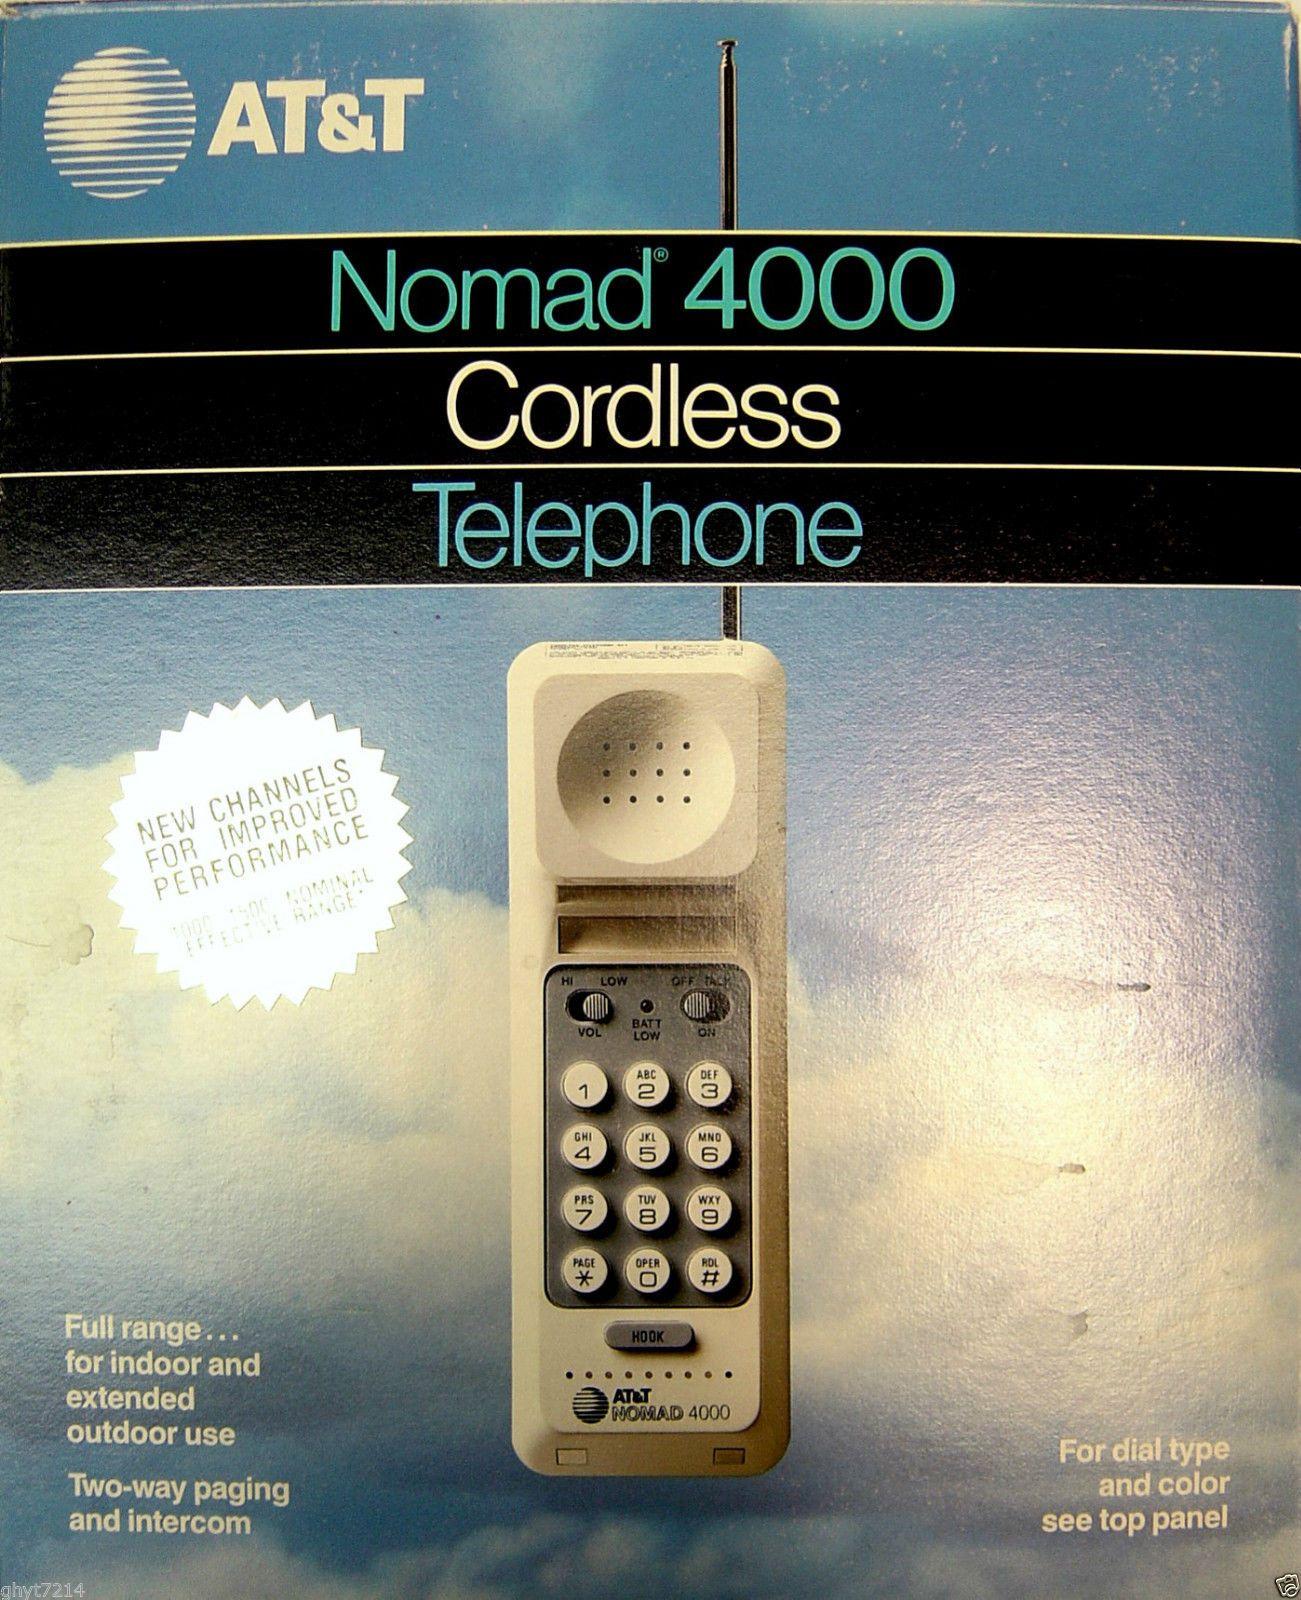 http://www.ebay.com/itm/VINTAGE-1984-RETRO-NOMAD-4000-CORDLESS-AT-T-PHONE-INTERCOM-BASE-ONLY-/141733874073?hash=item20ffff4999